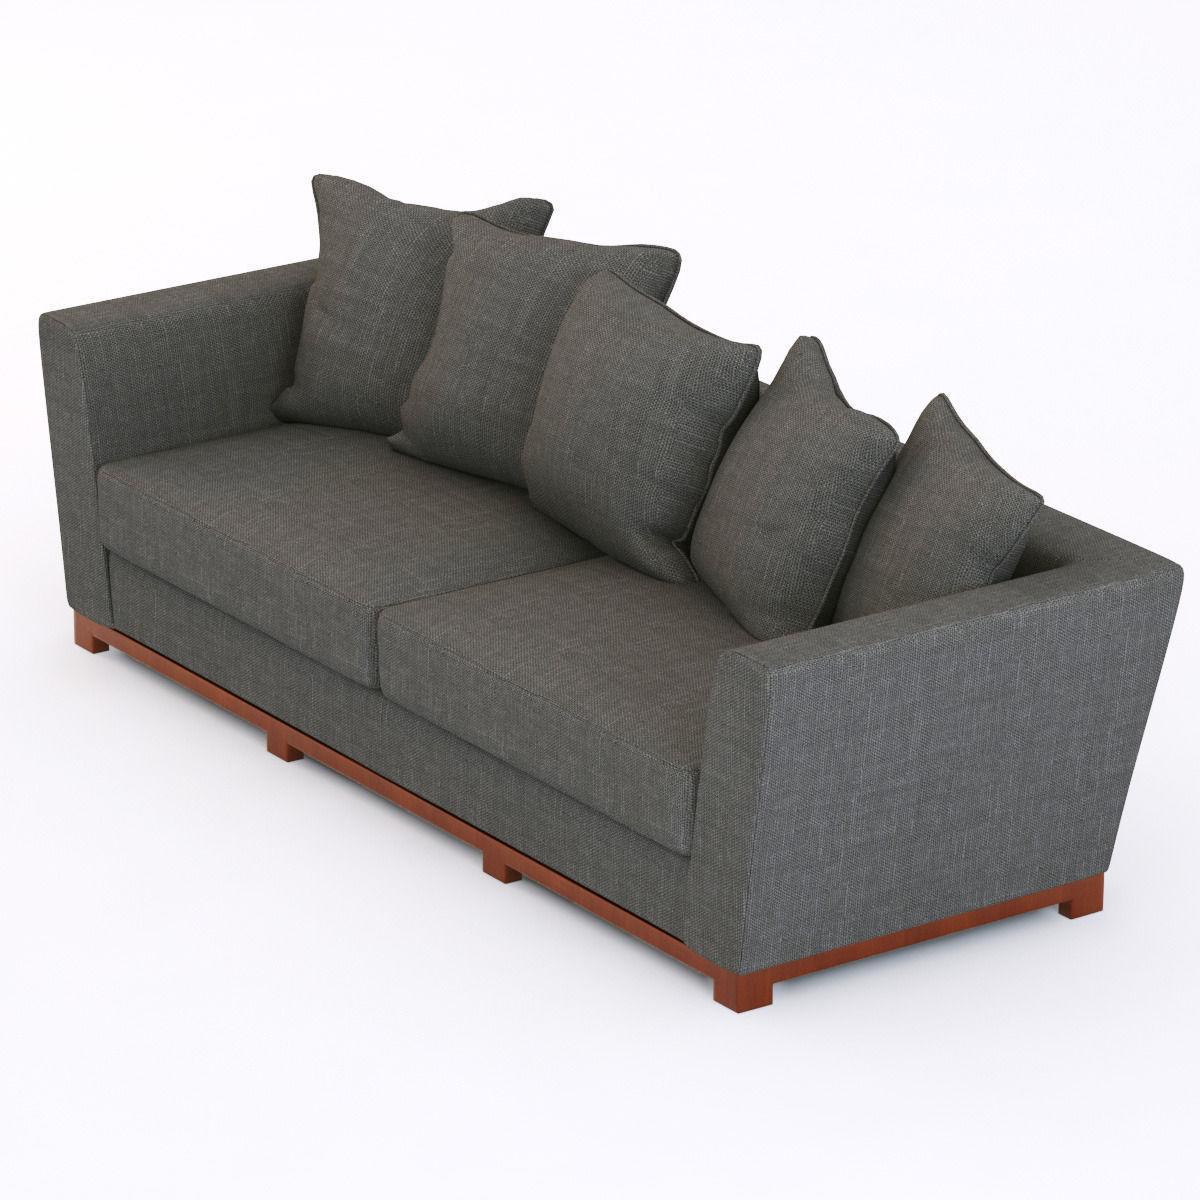 Portland Modern Sofa 3d Model Max Obj 3ds Fbx